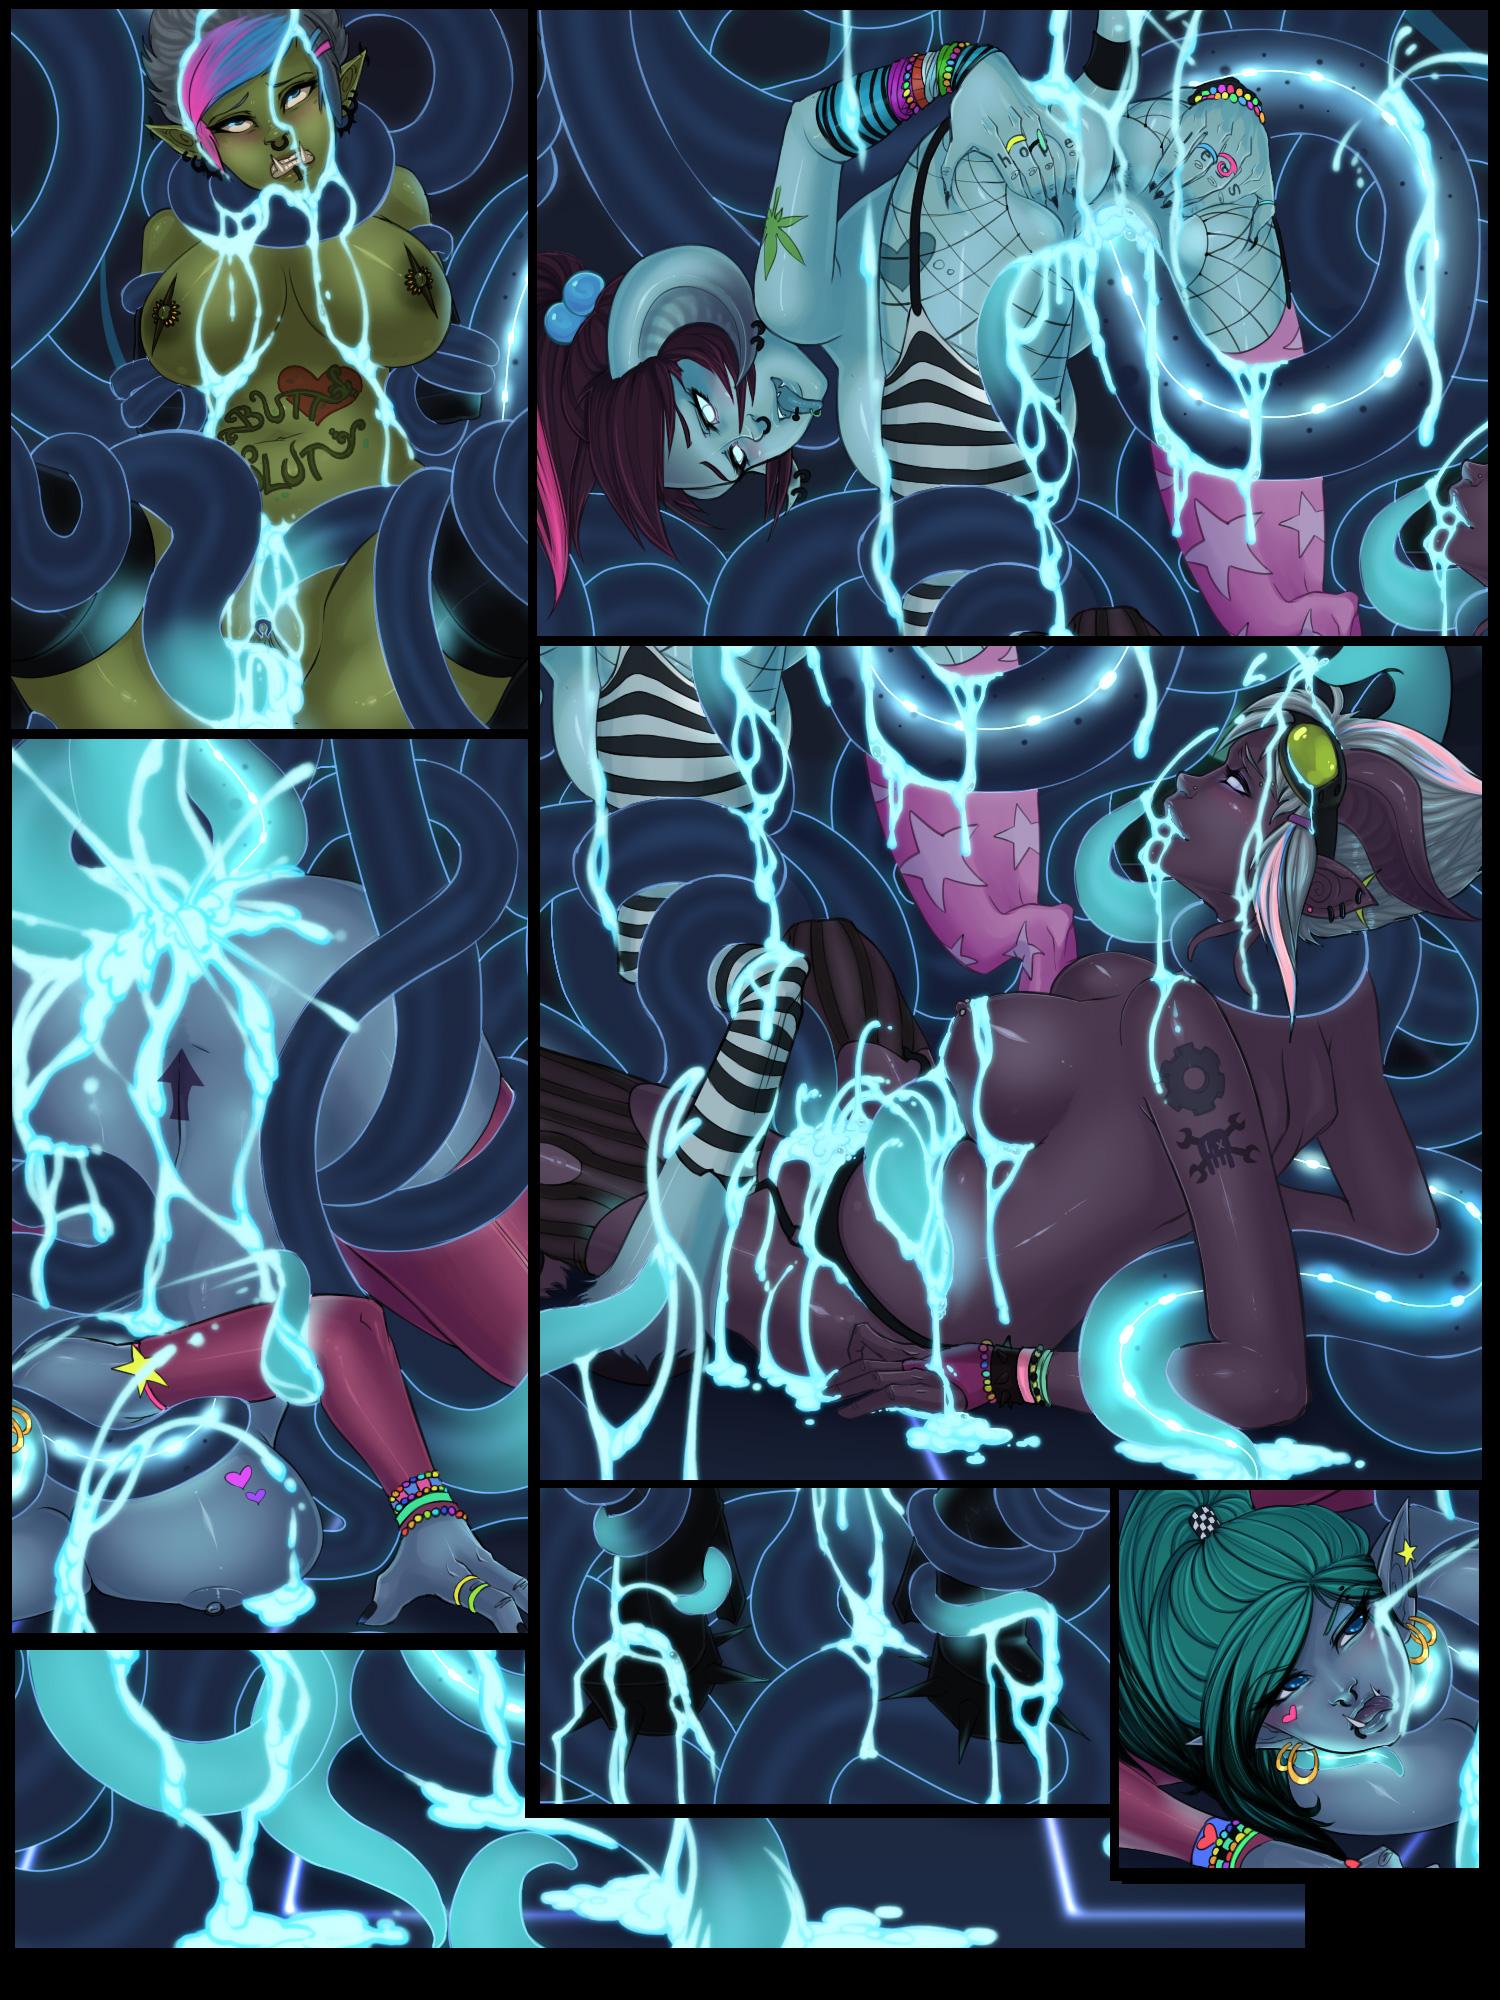 World of warcraft tentacle rape smut comics